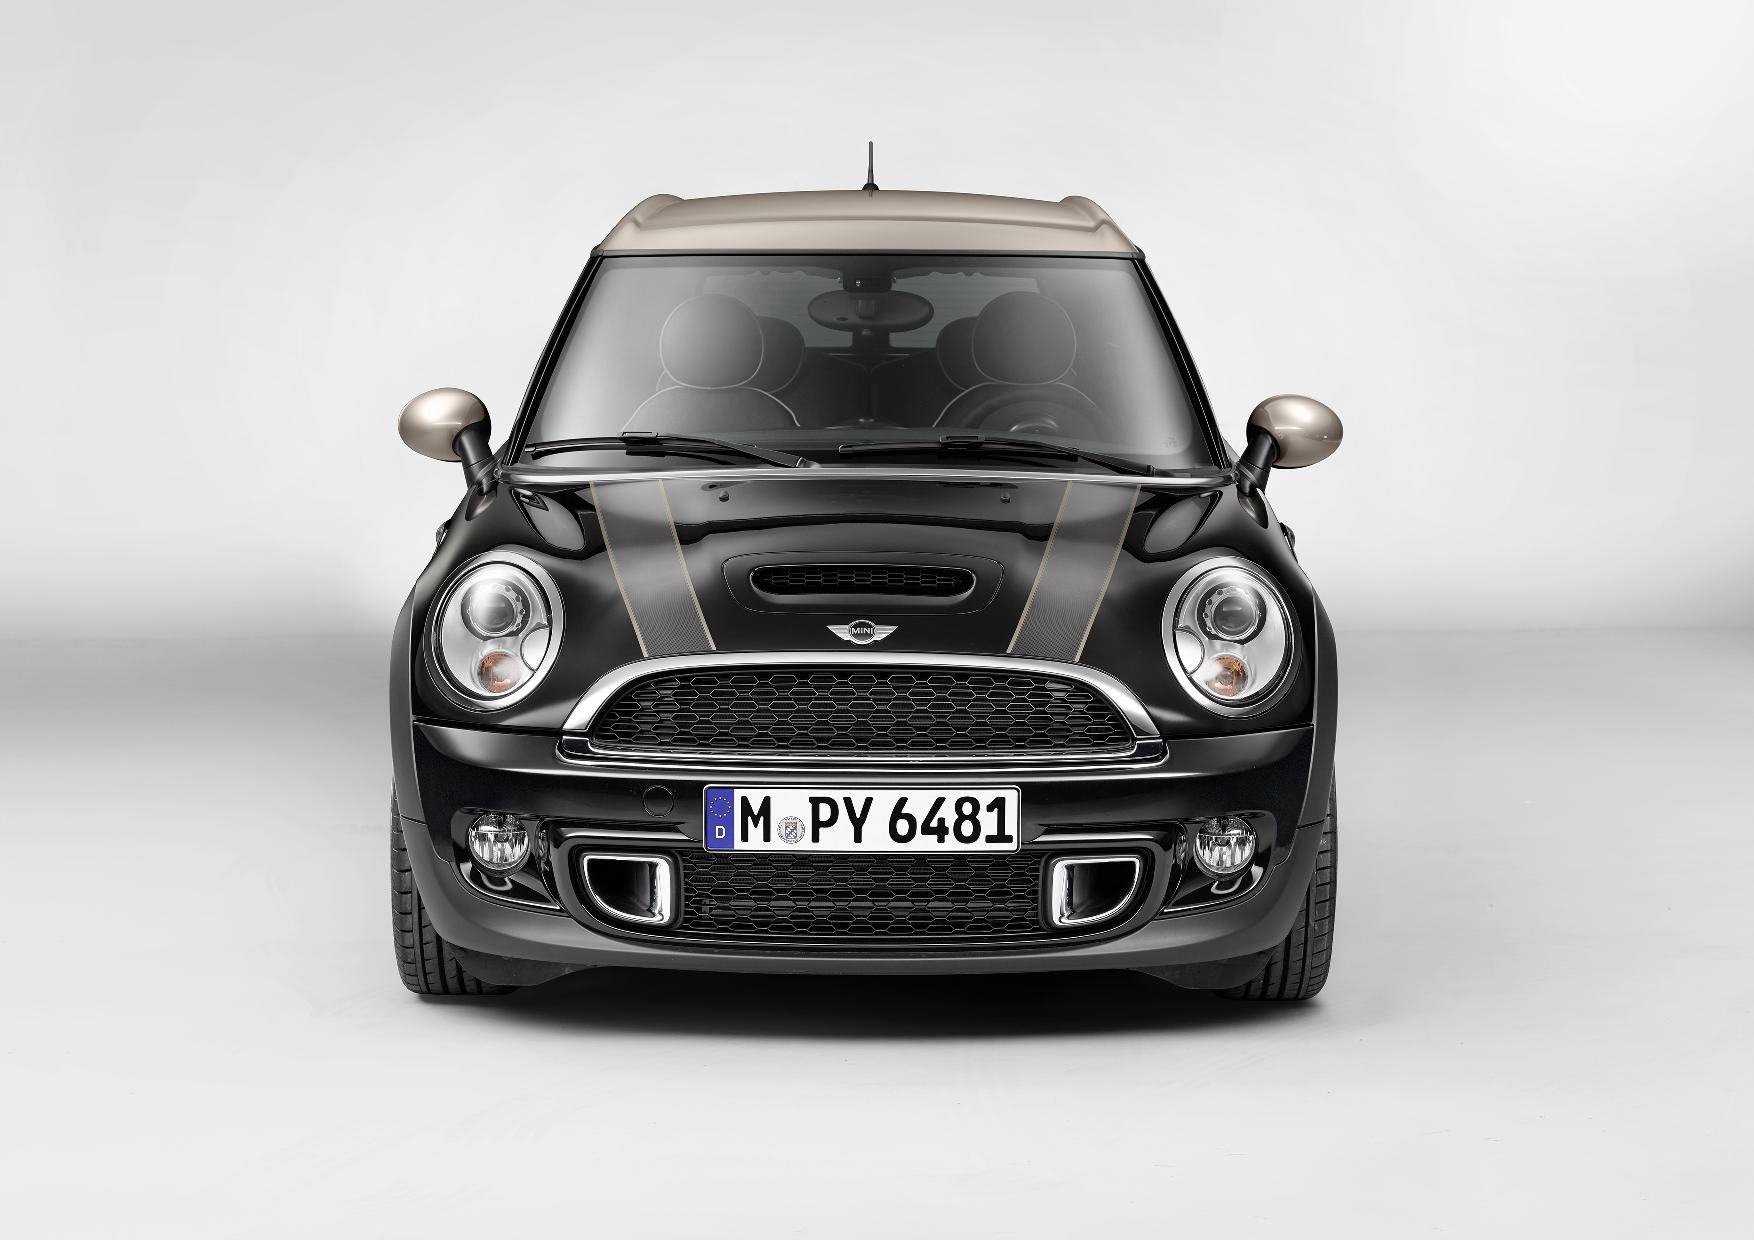 Mini Cooper Models >> MINI Clubman Bond Street Special Edition - autoevolution